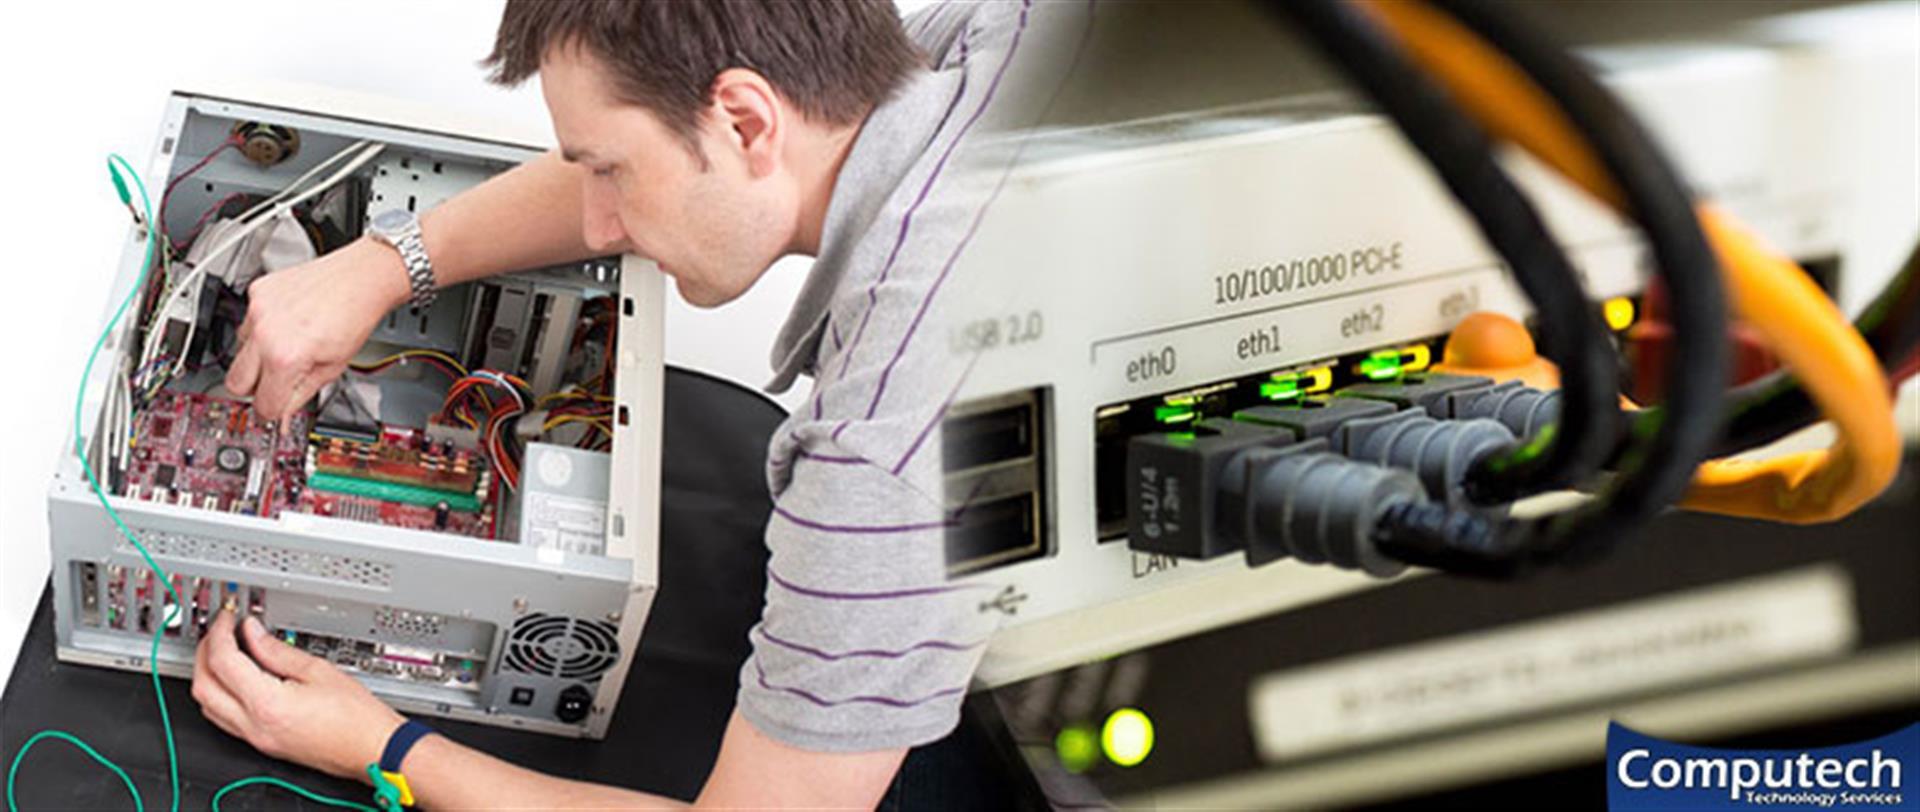 Ashburn Georgia On-Site Computer PC & Printer Repair, Networks, Voice & Data Cabling Contractors